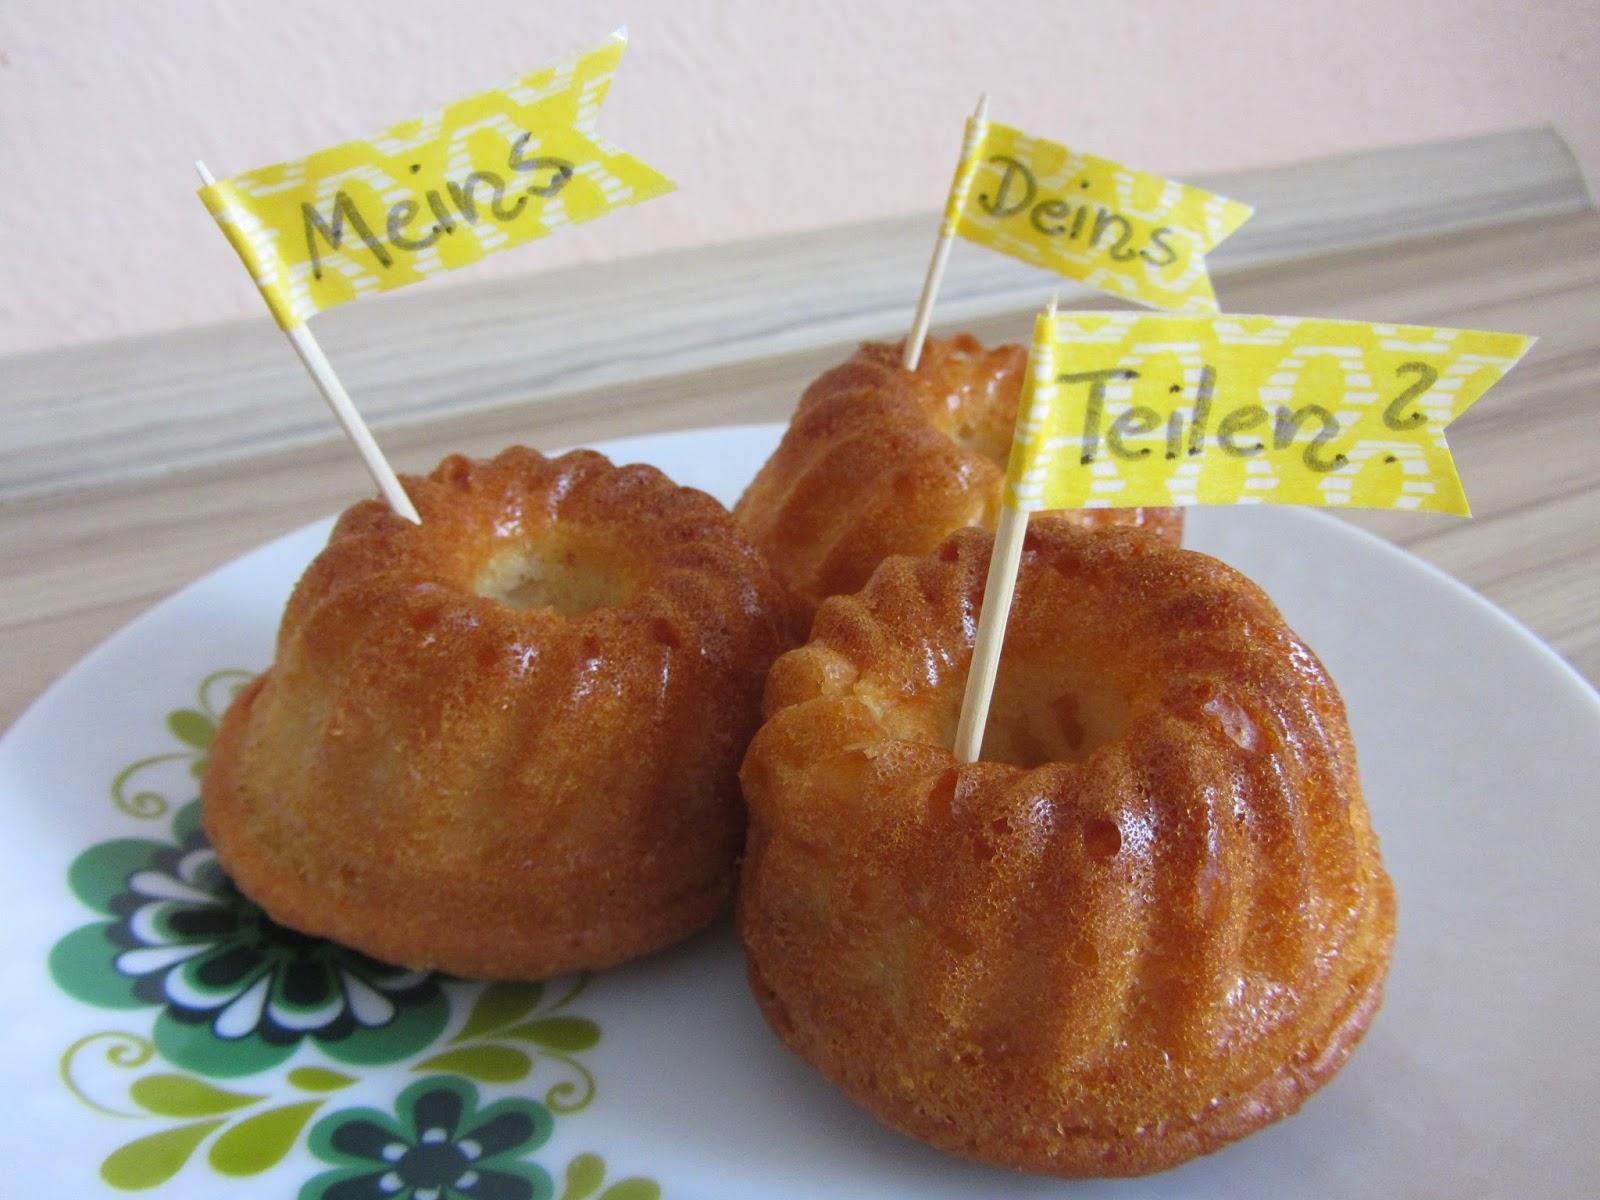 Backen, Masking Tape, Liebenswelt, DIY Blog, Häkelblog, Rezept Muffins